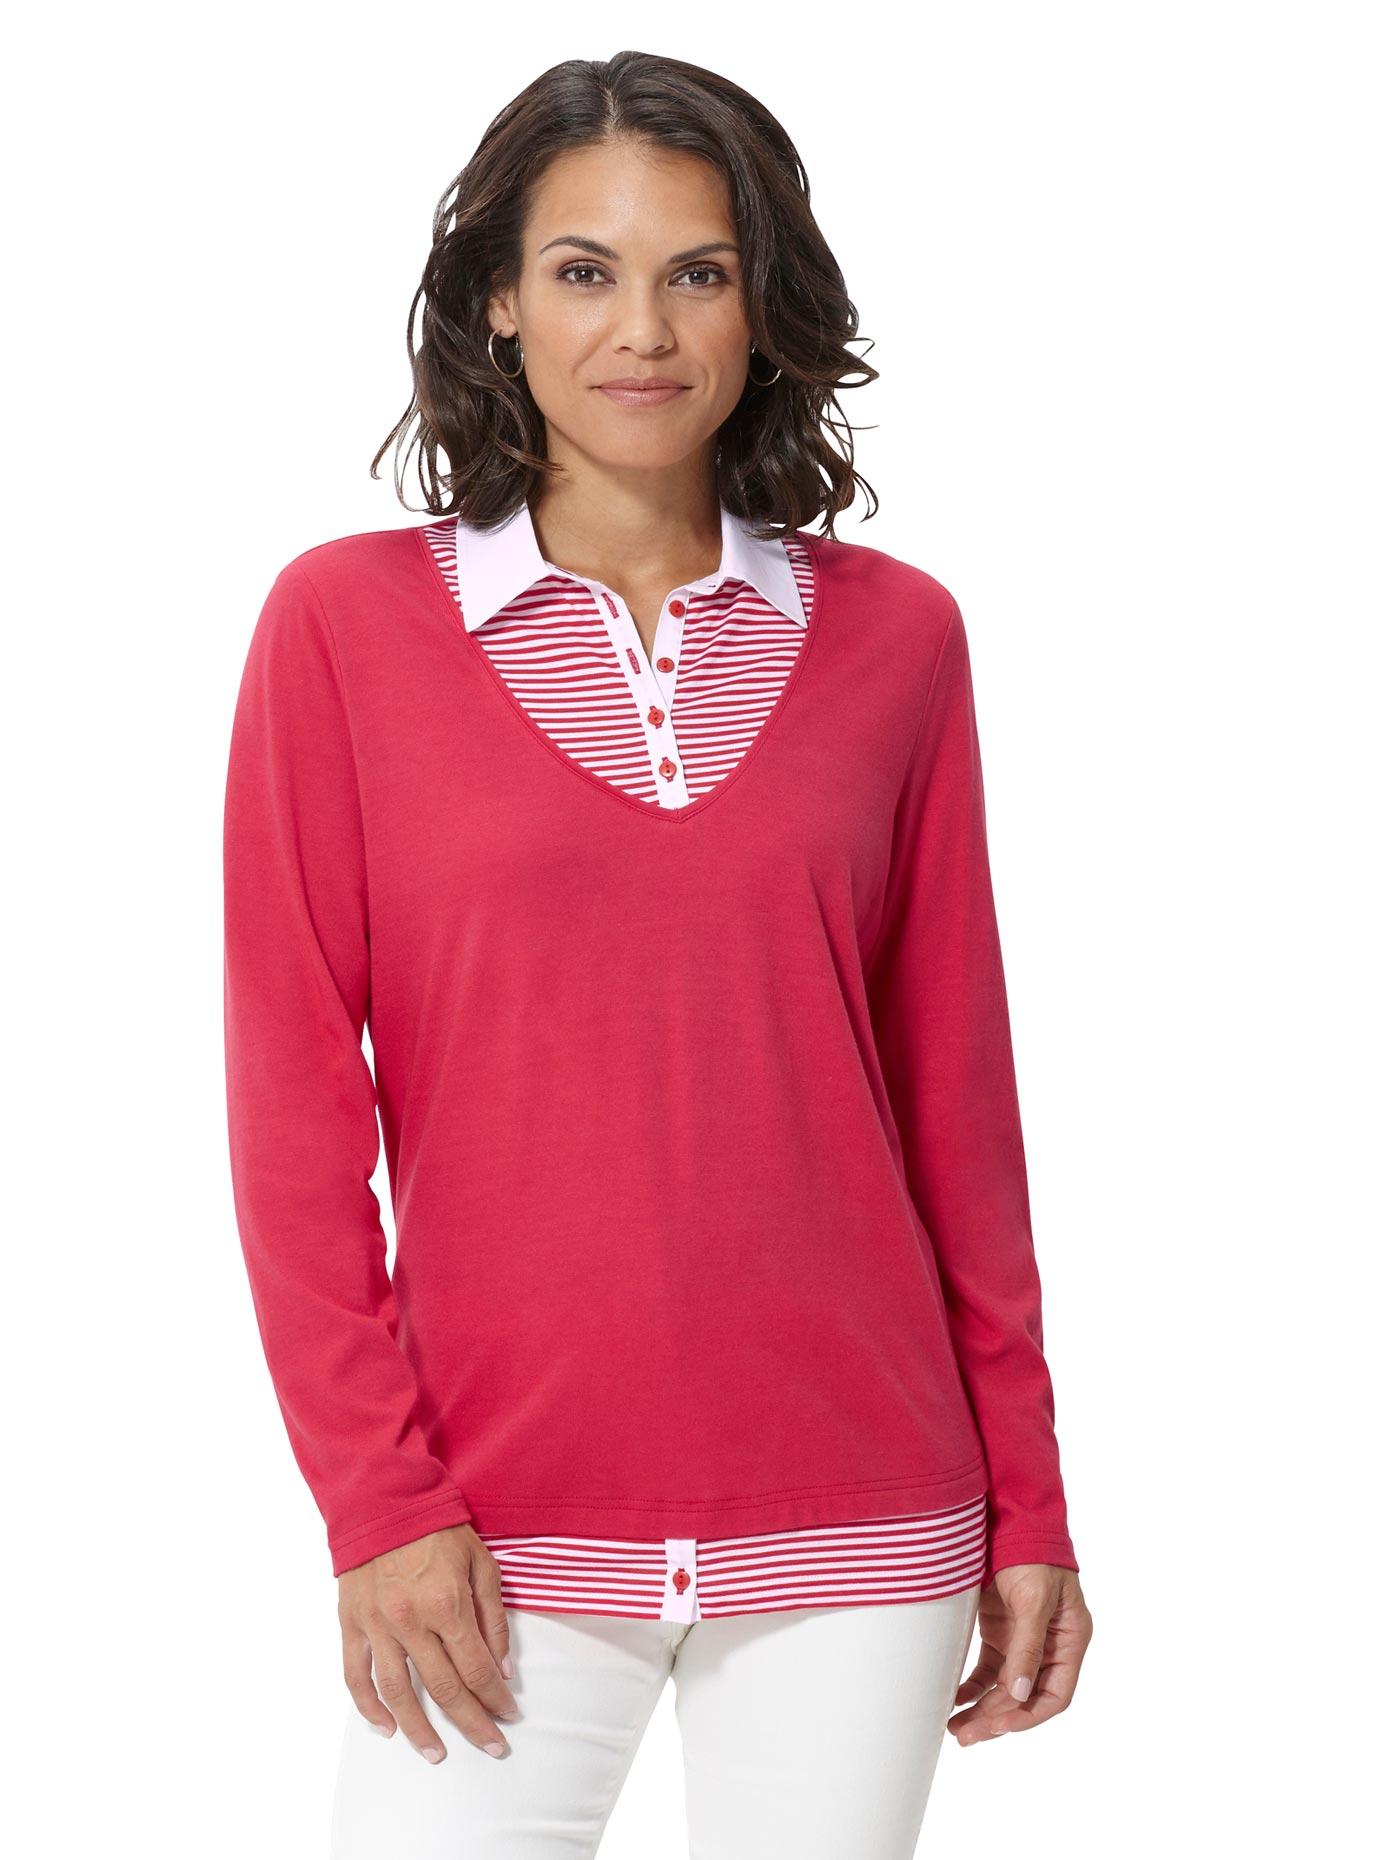 Casual Looks 2-in-1-Shirt im attraktiven Look | Bekleidung > Shirts > 2-in-1 Shirts | Rot | Casual Looks